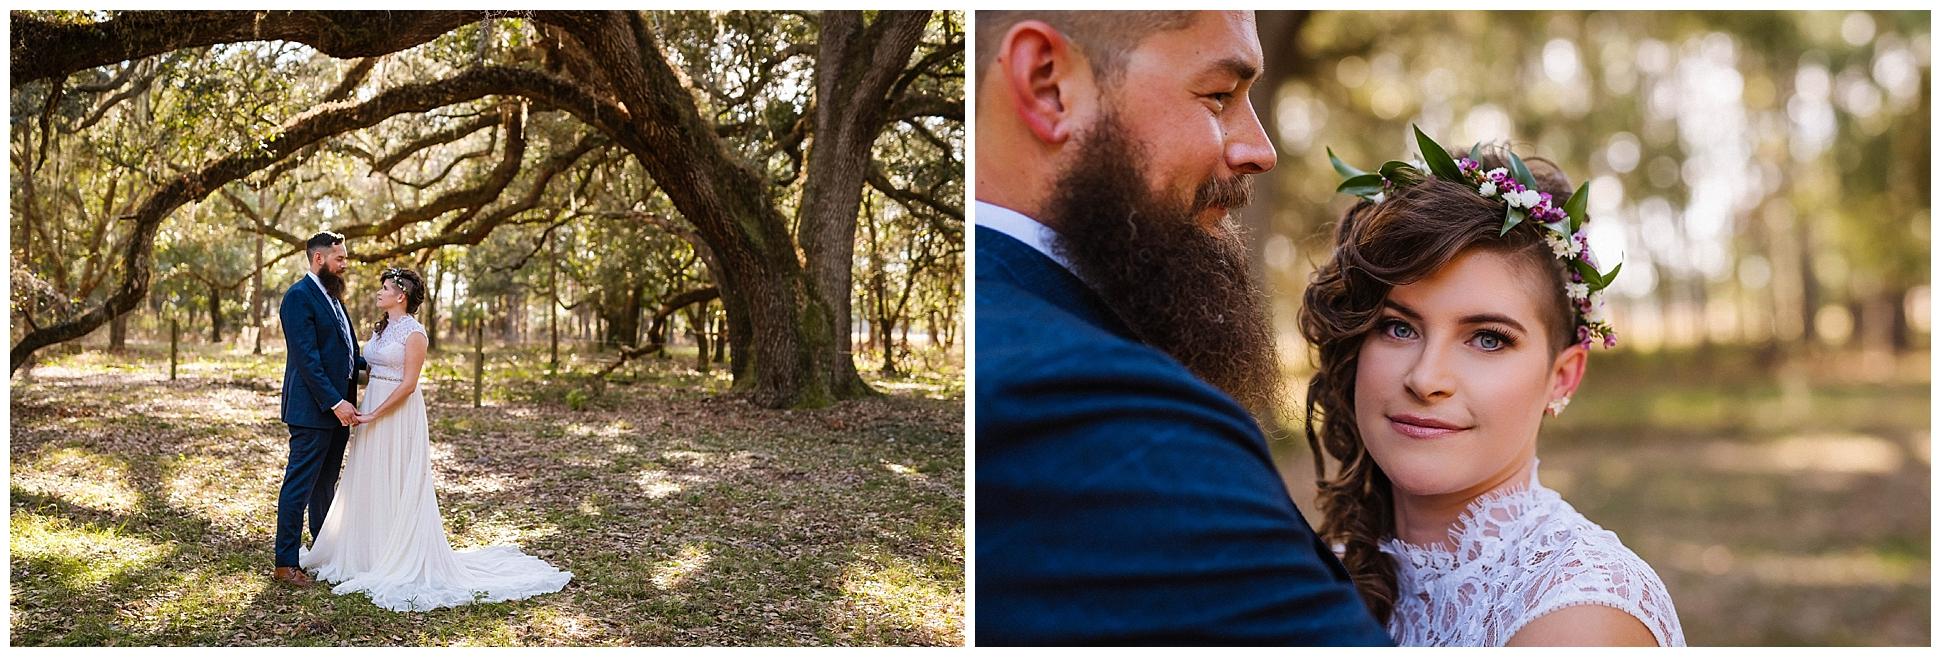 magical-outdoor-florida-wedding-smoke-bombs-flowers-crown-beard_0017.jpg